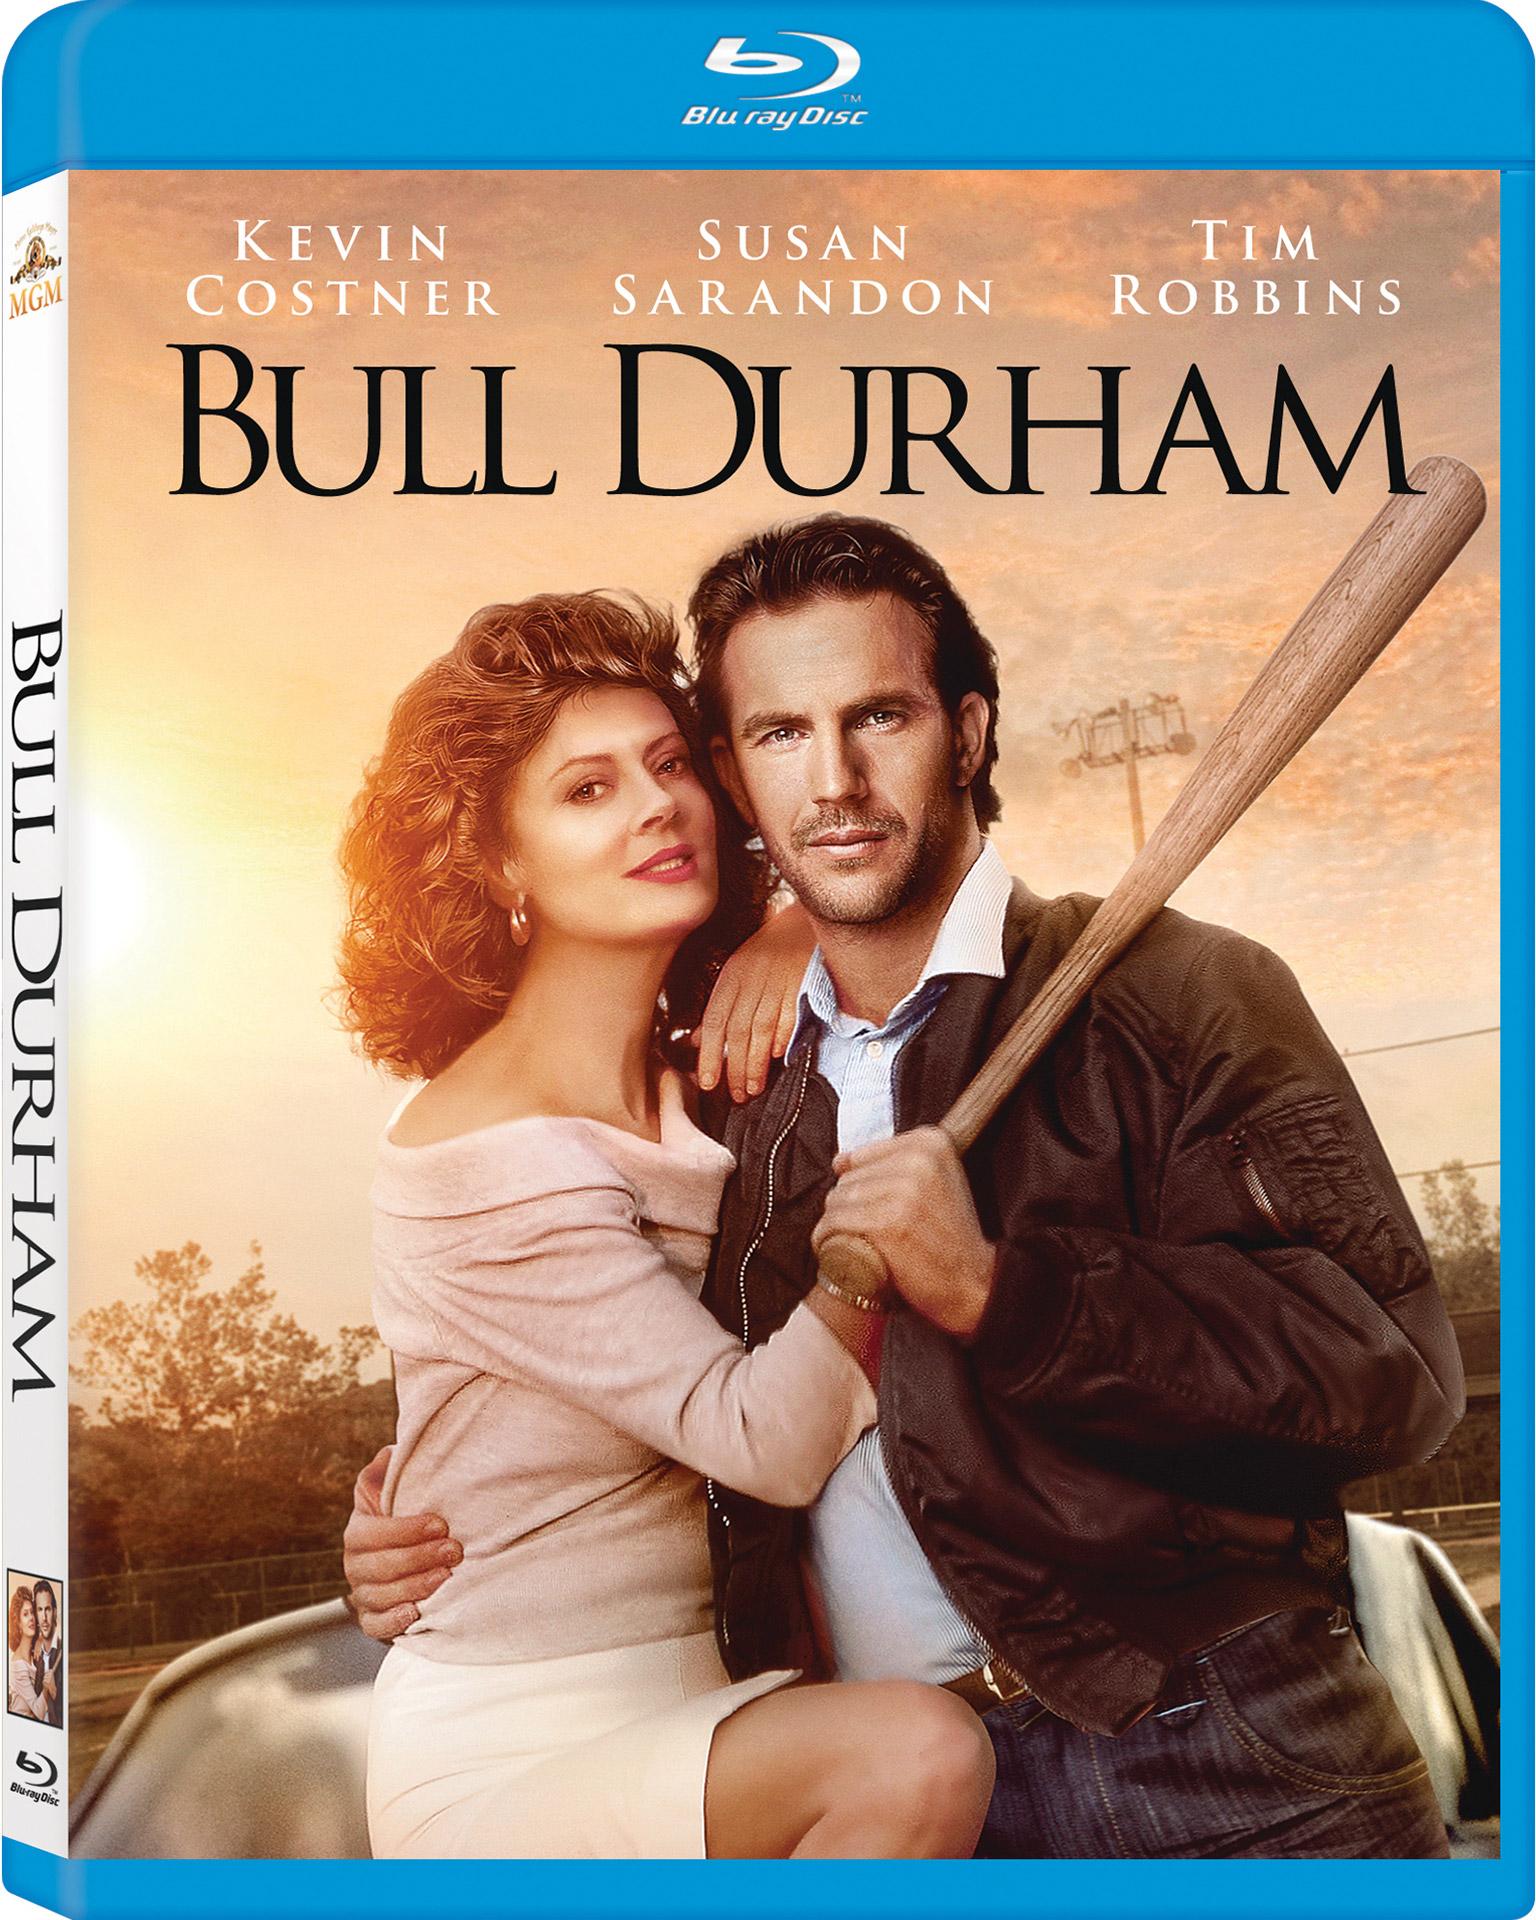 friday flicks sandlot cinema 5 � bull durham lifetime